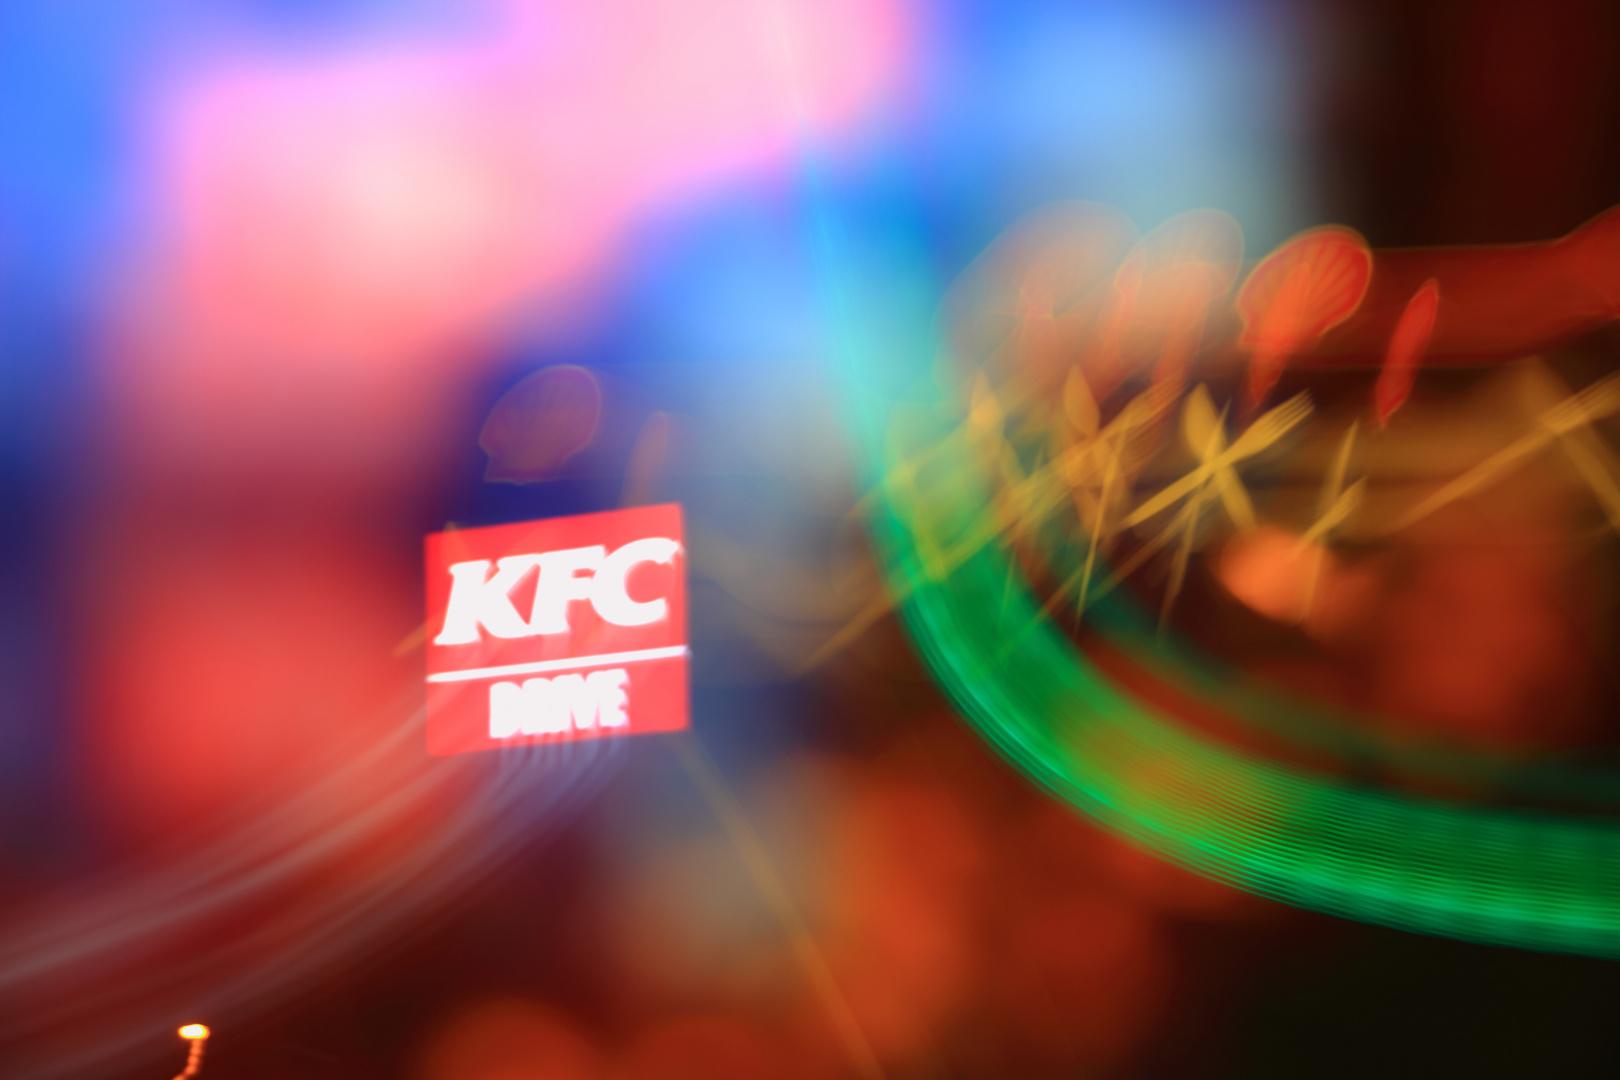 KFC - Shell